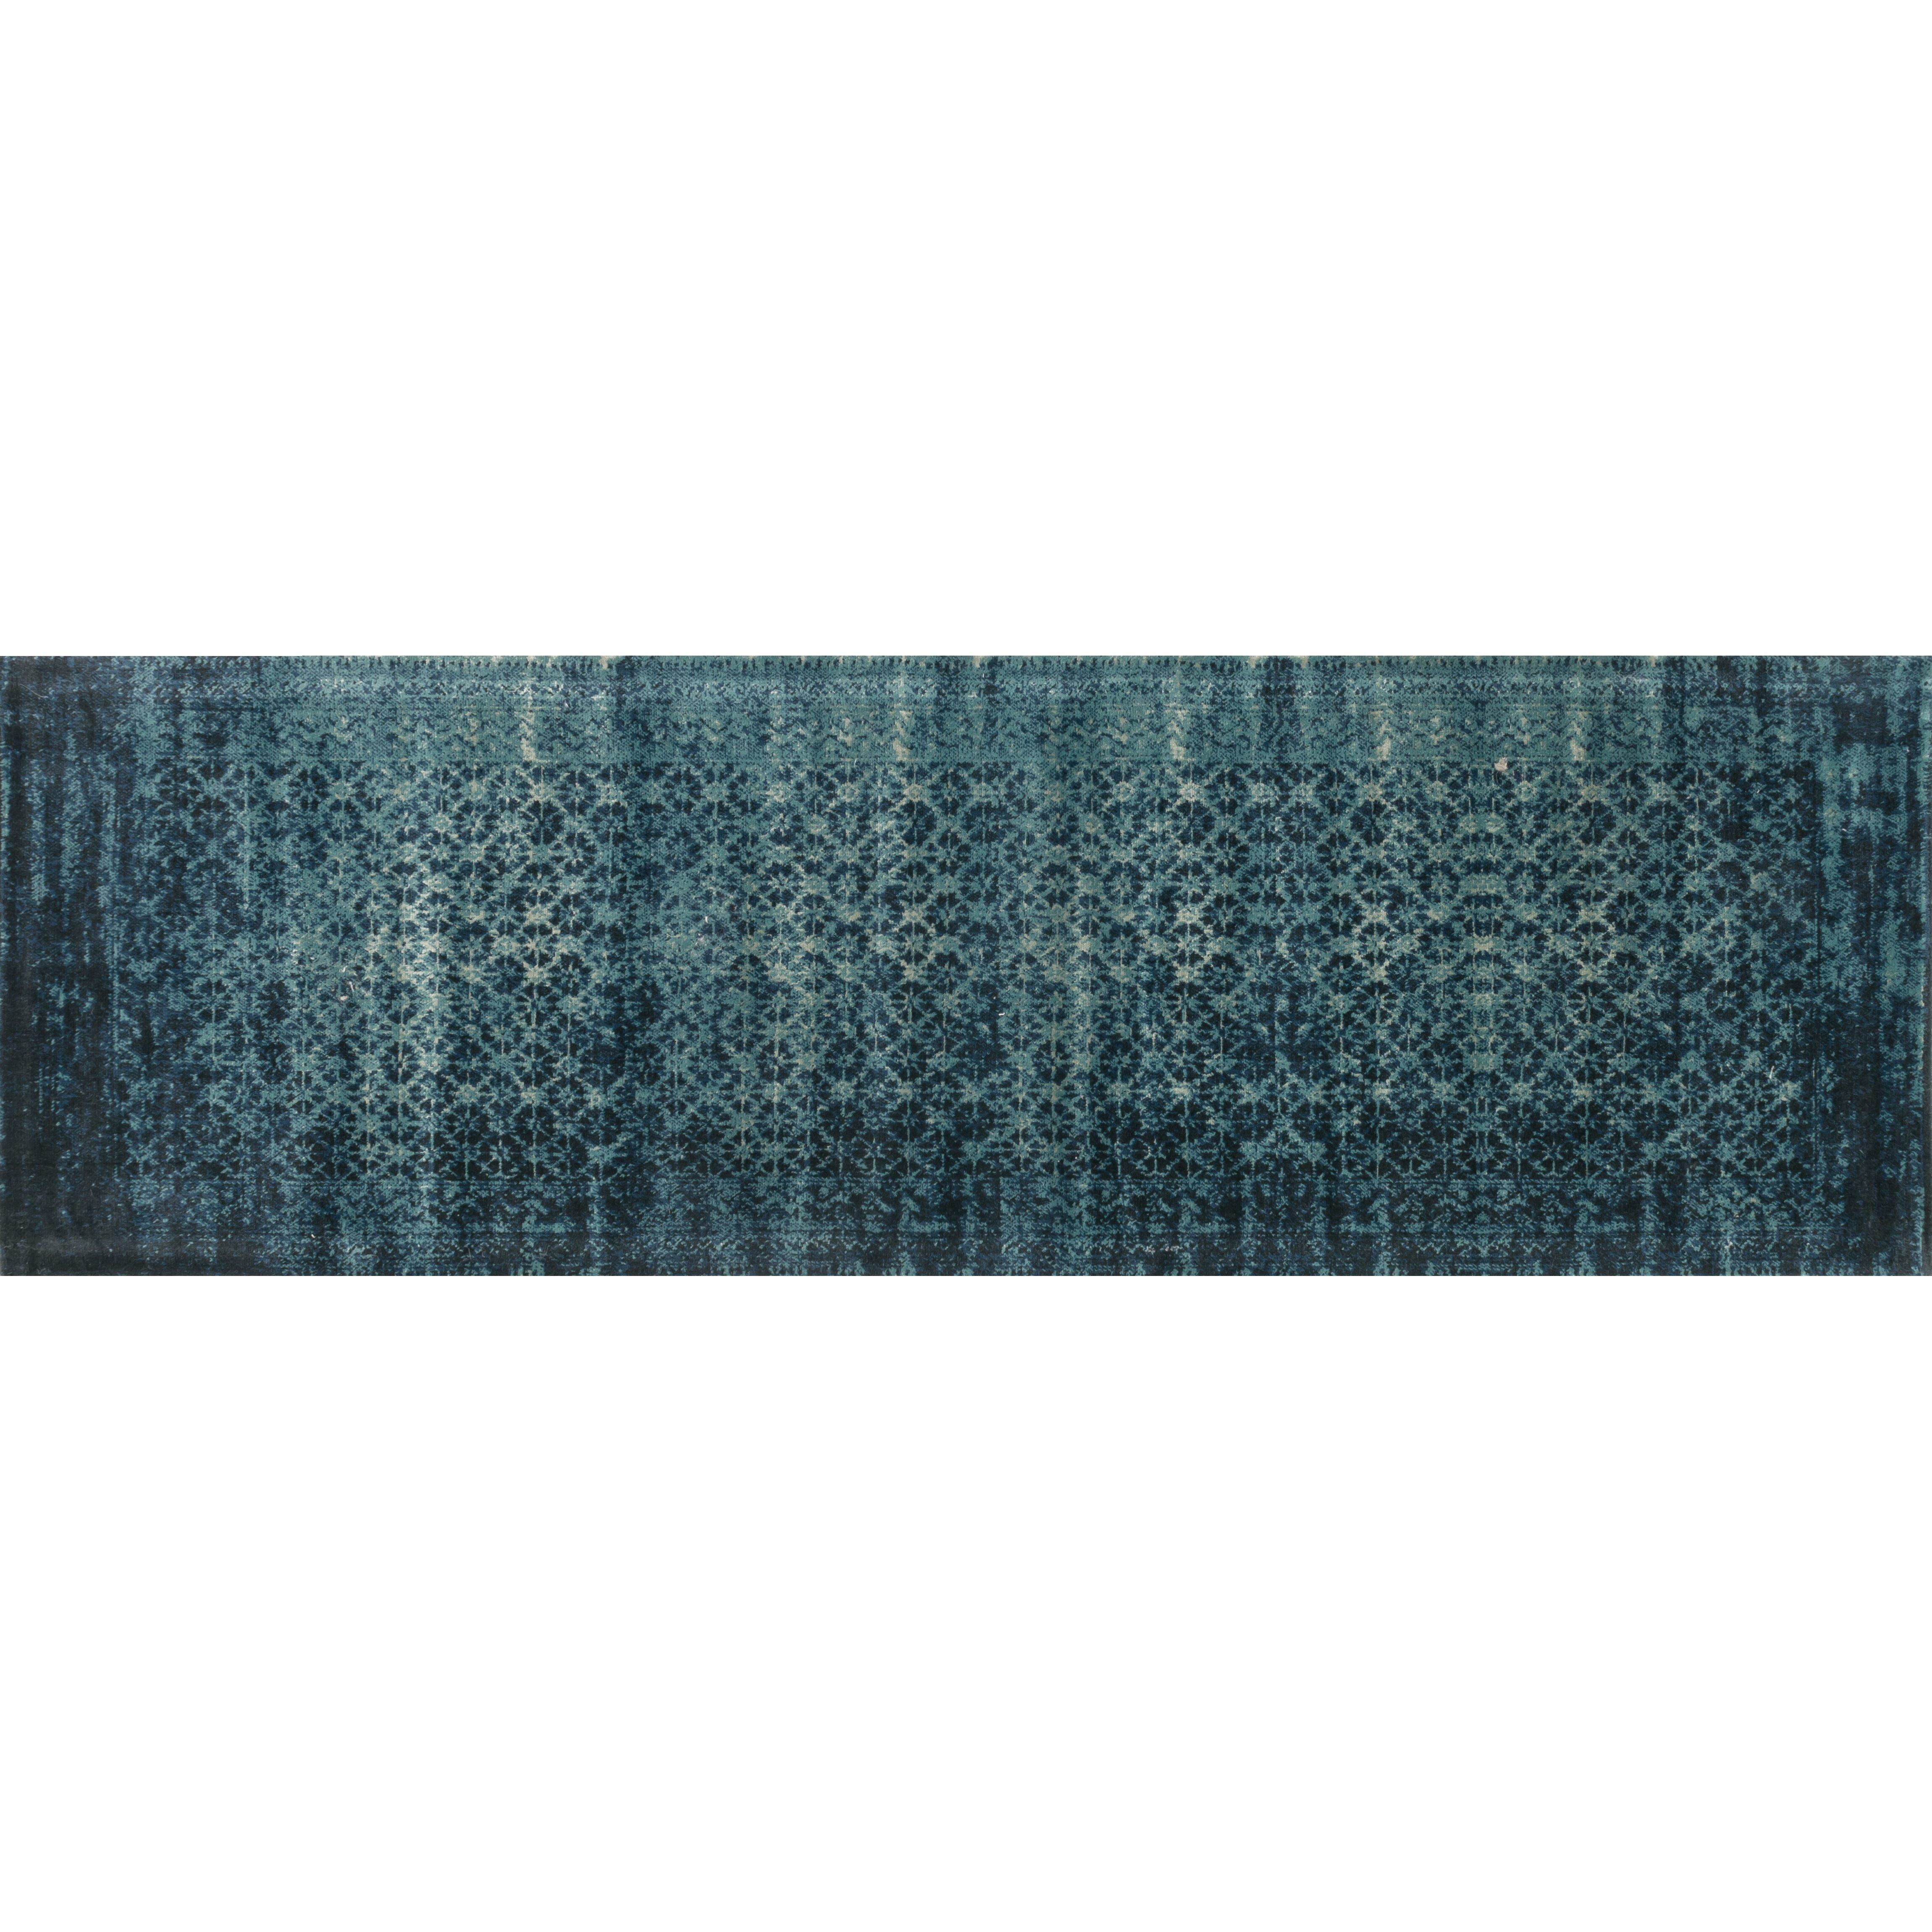 Loloi Rugs Journey Indigo Blue Area Rug Amp Reviews Wayfair